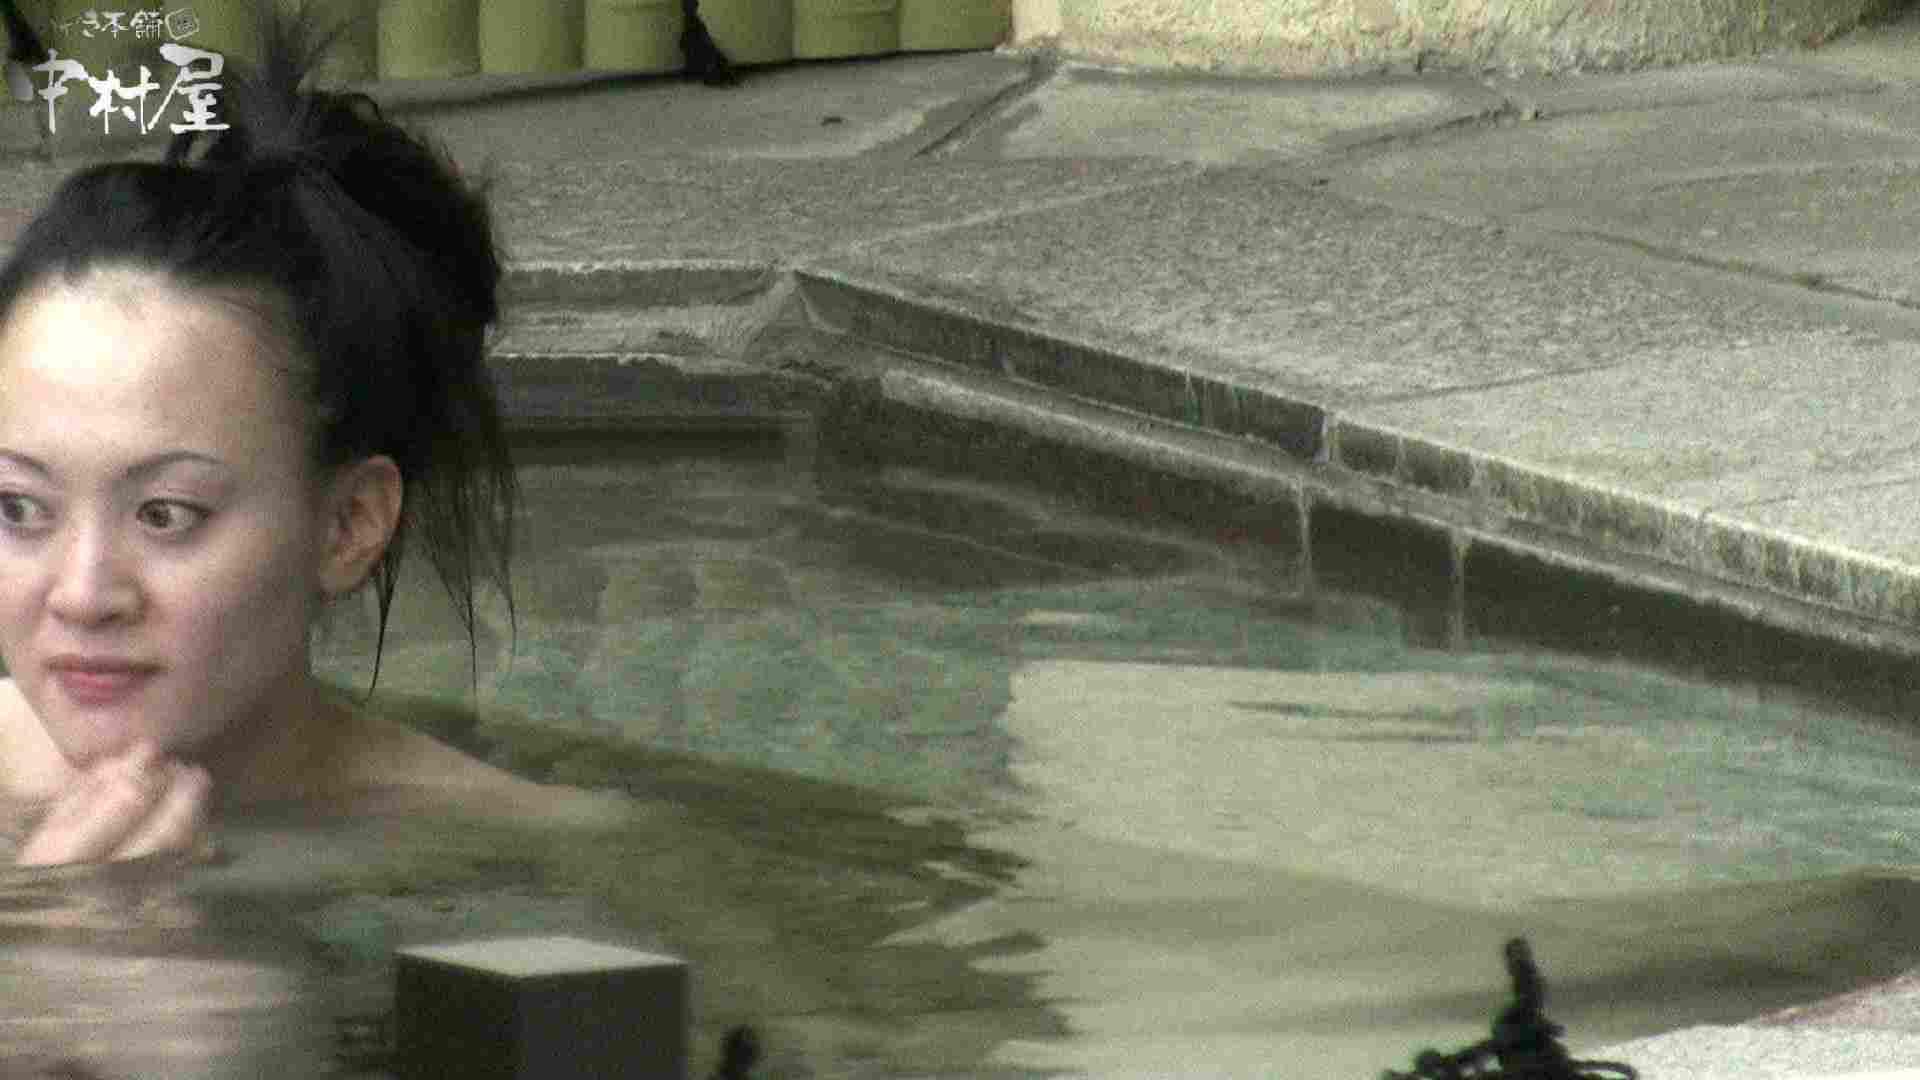 Aquaな露天風呂Vol.900 OLのエロ生活 すけべAV動画紹介 88連発 35